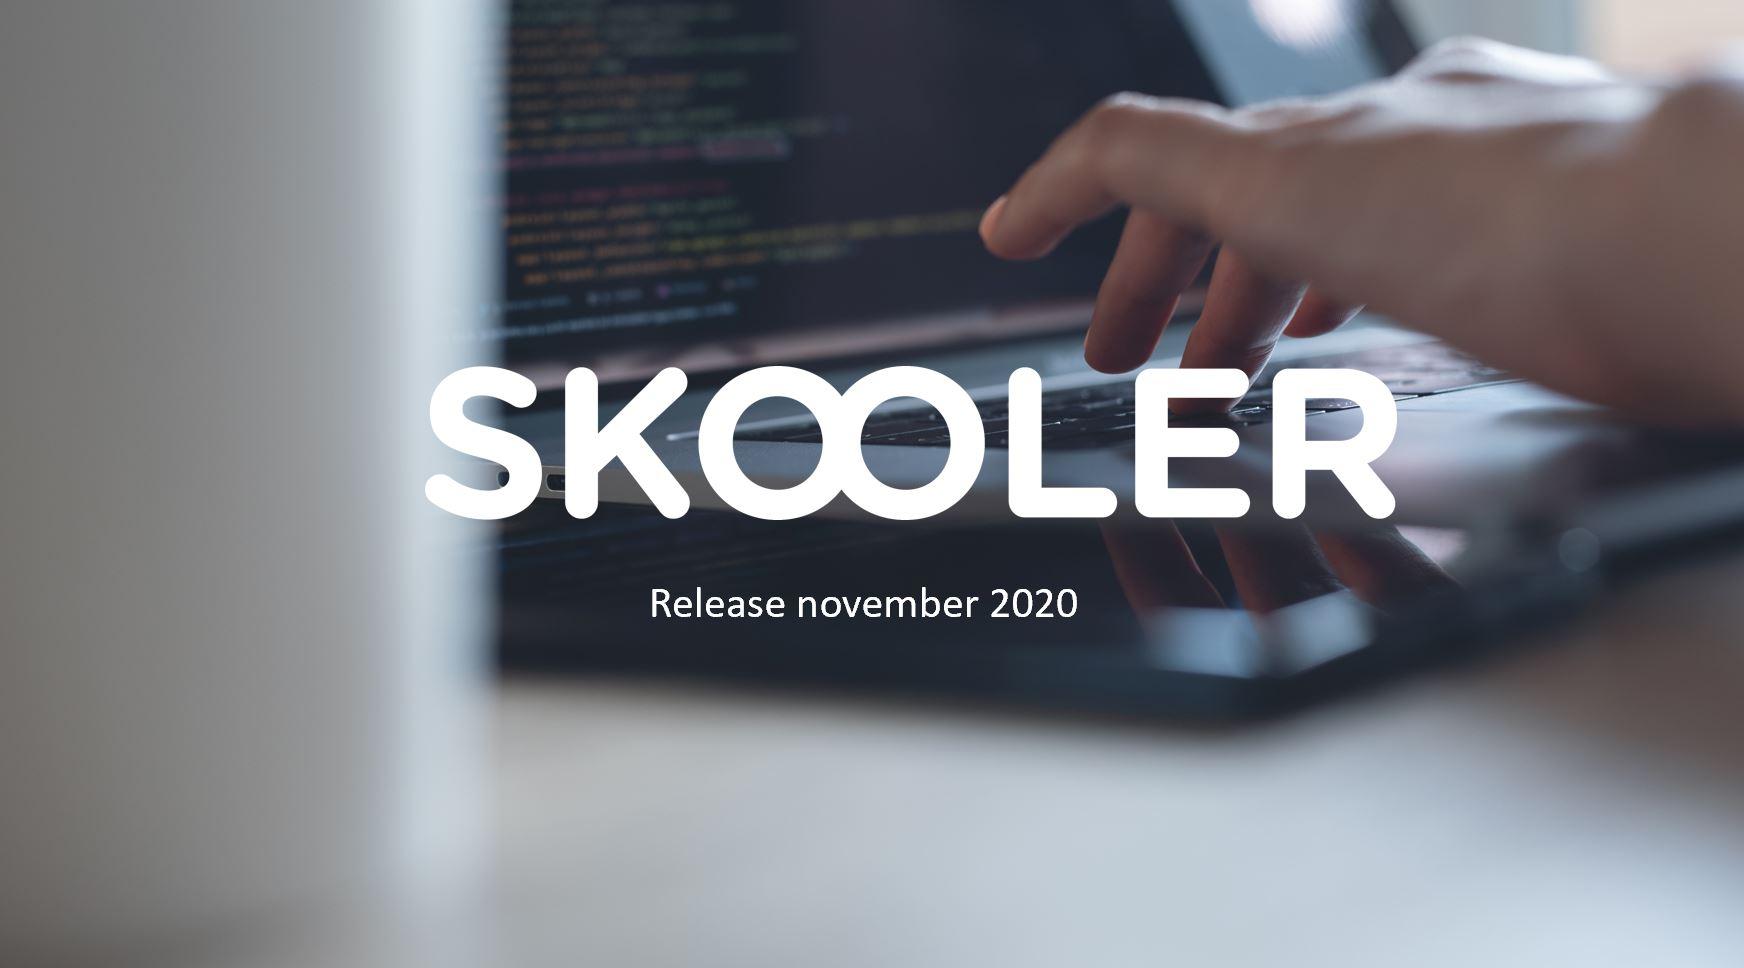 Release – november 2020